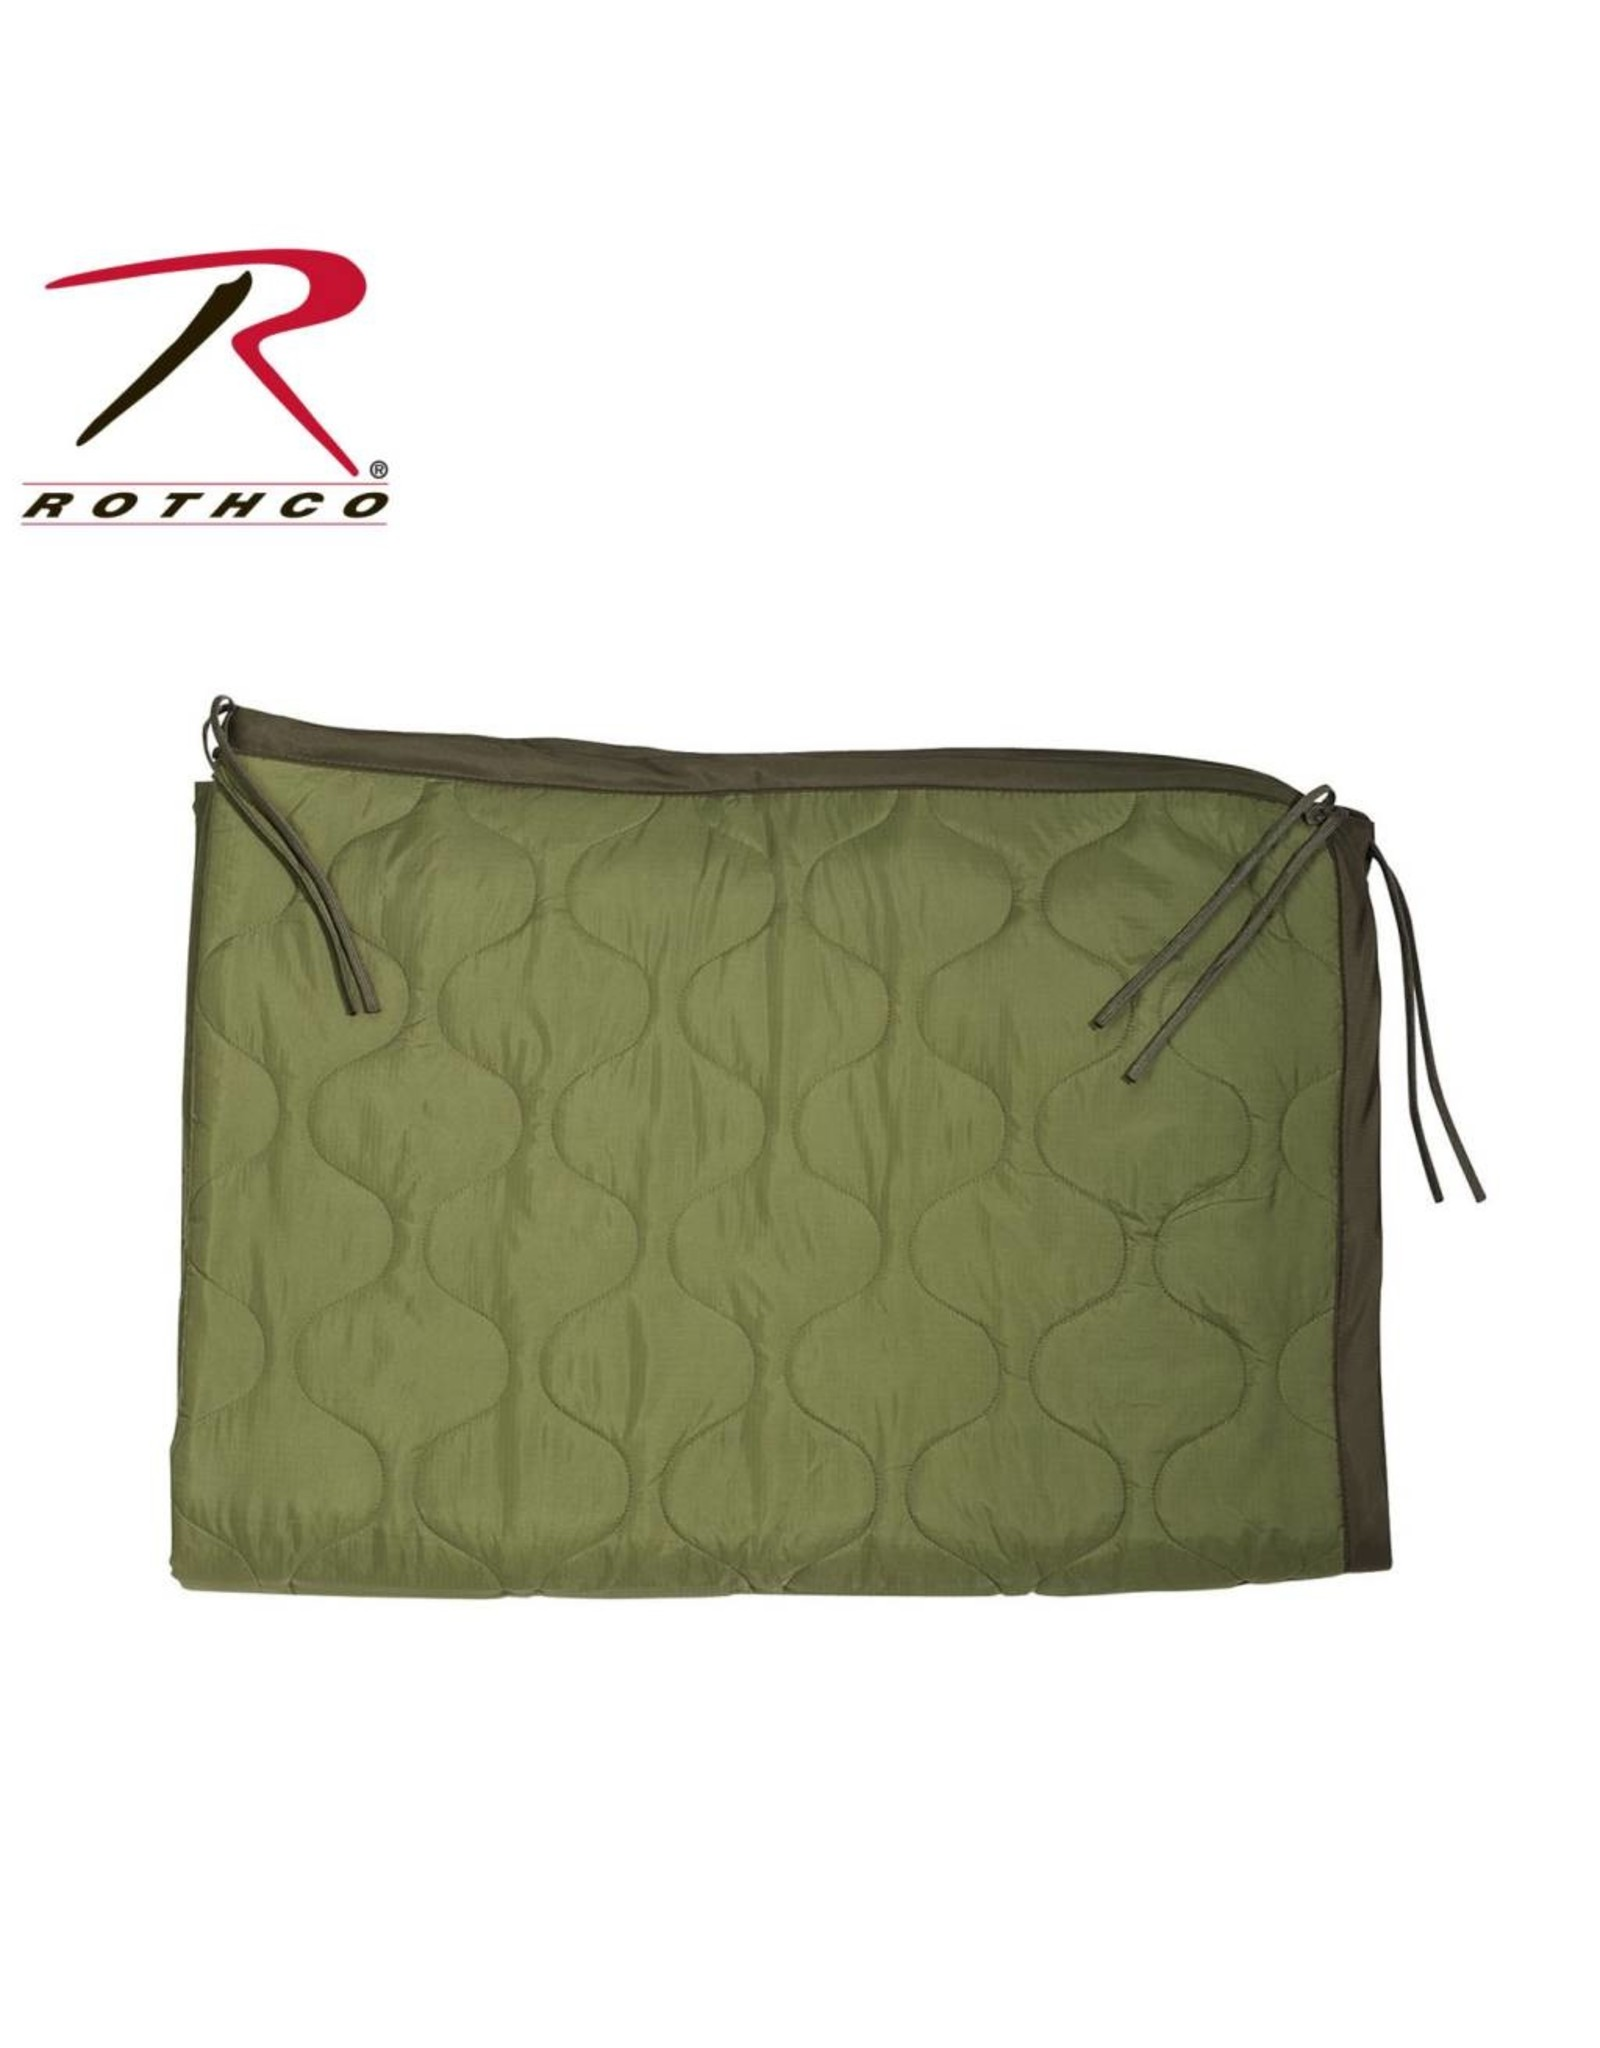 ROTHCO ROTHCO  OLIVE RANGER/ PONCHO LINER -NEW